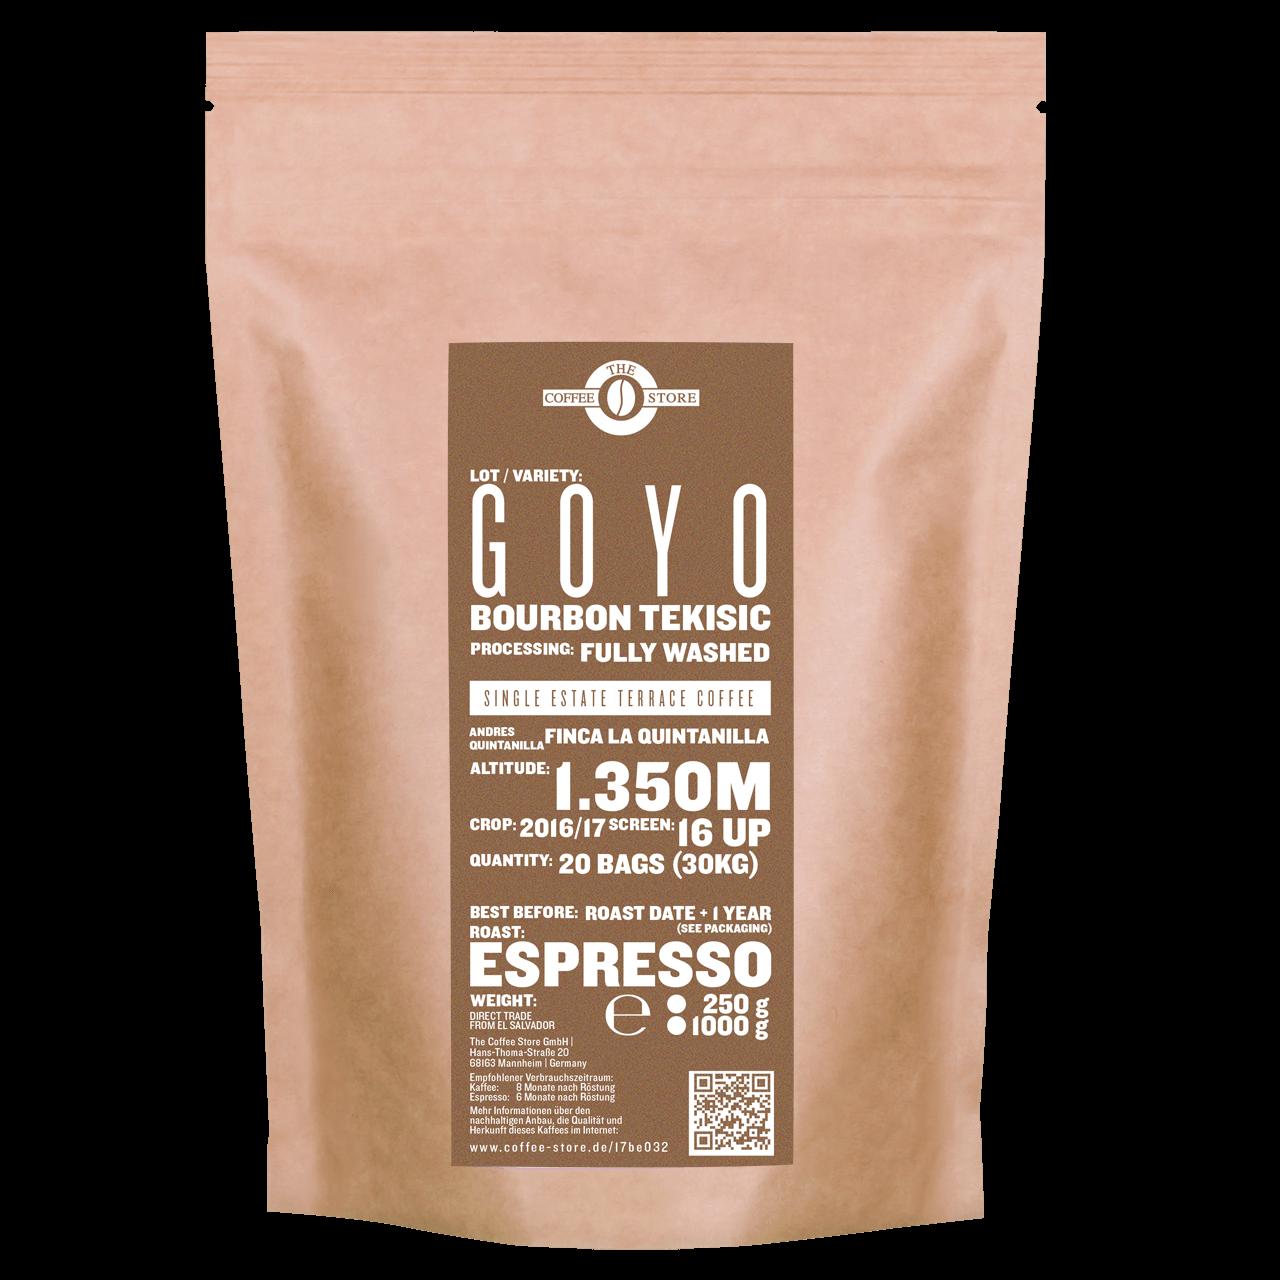 Goyo, Bourbon Tekisic - Espressoröstung